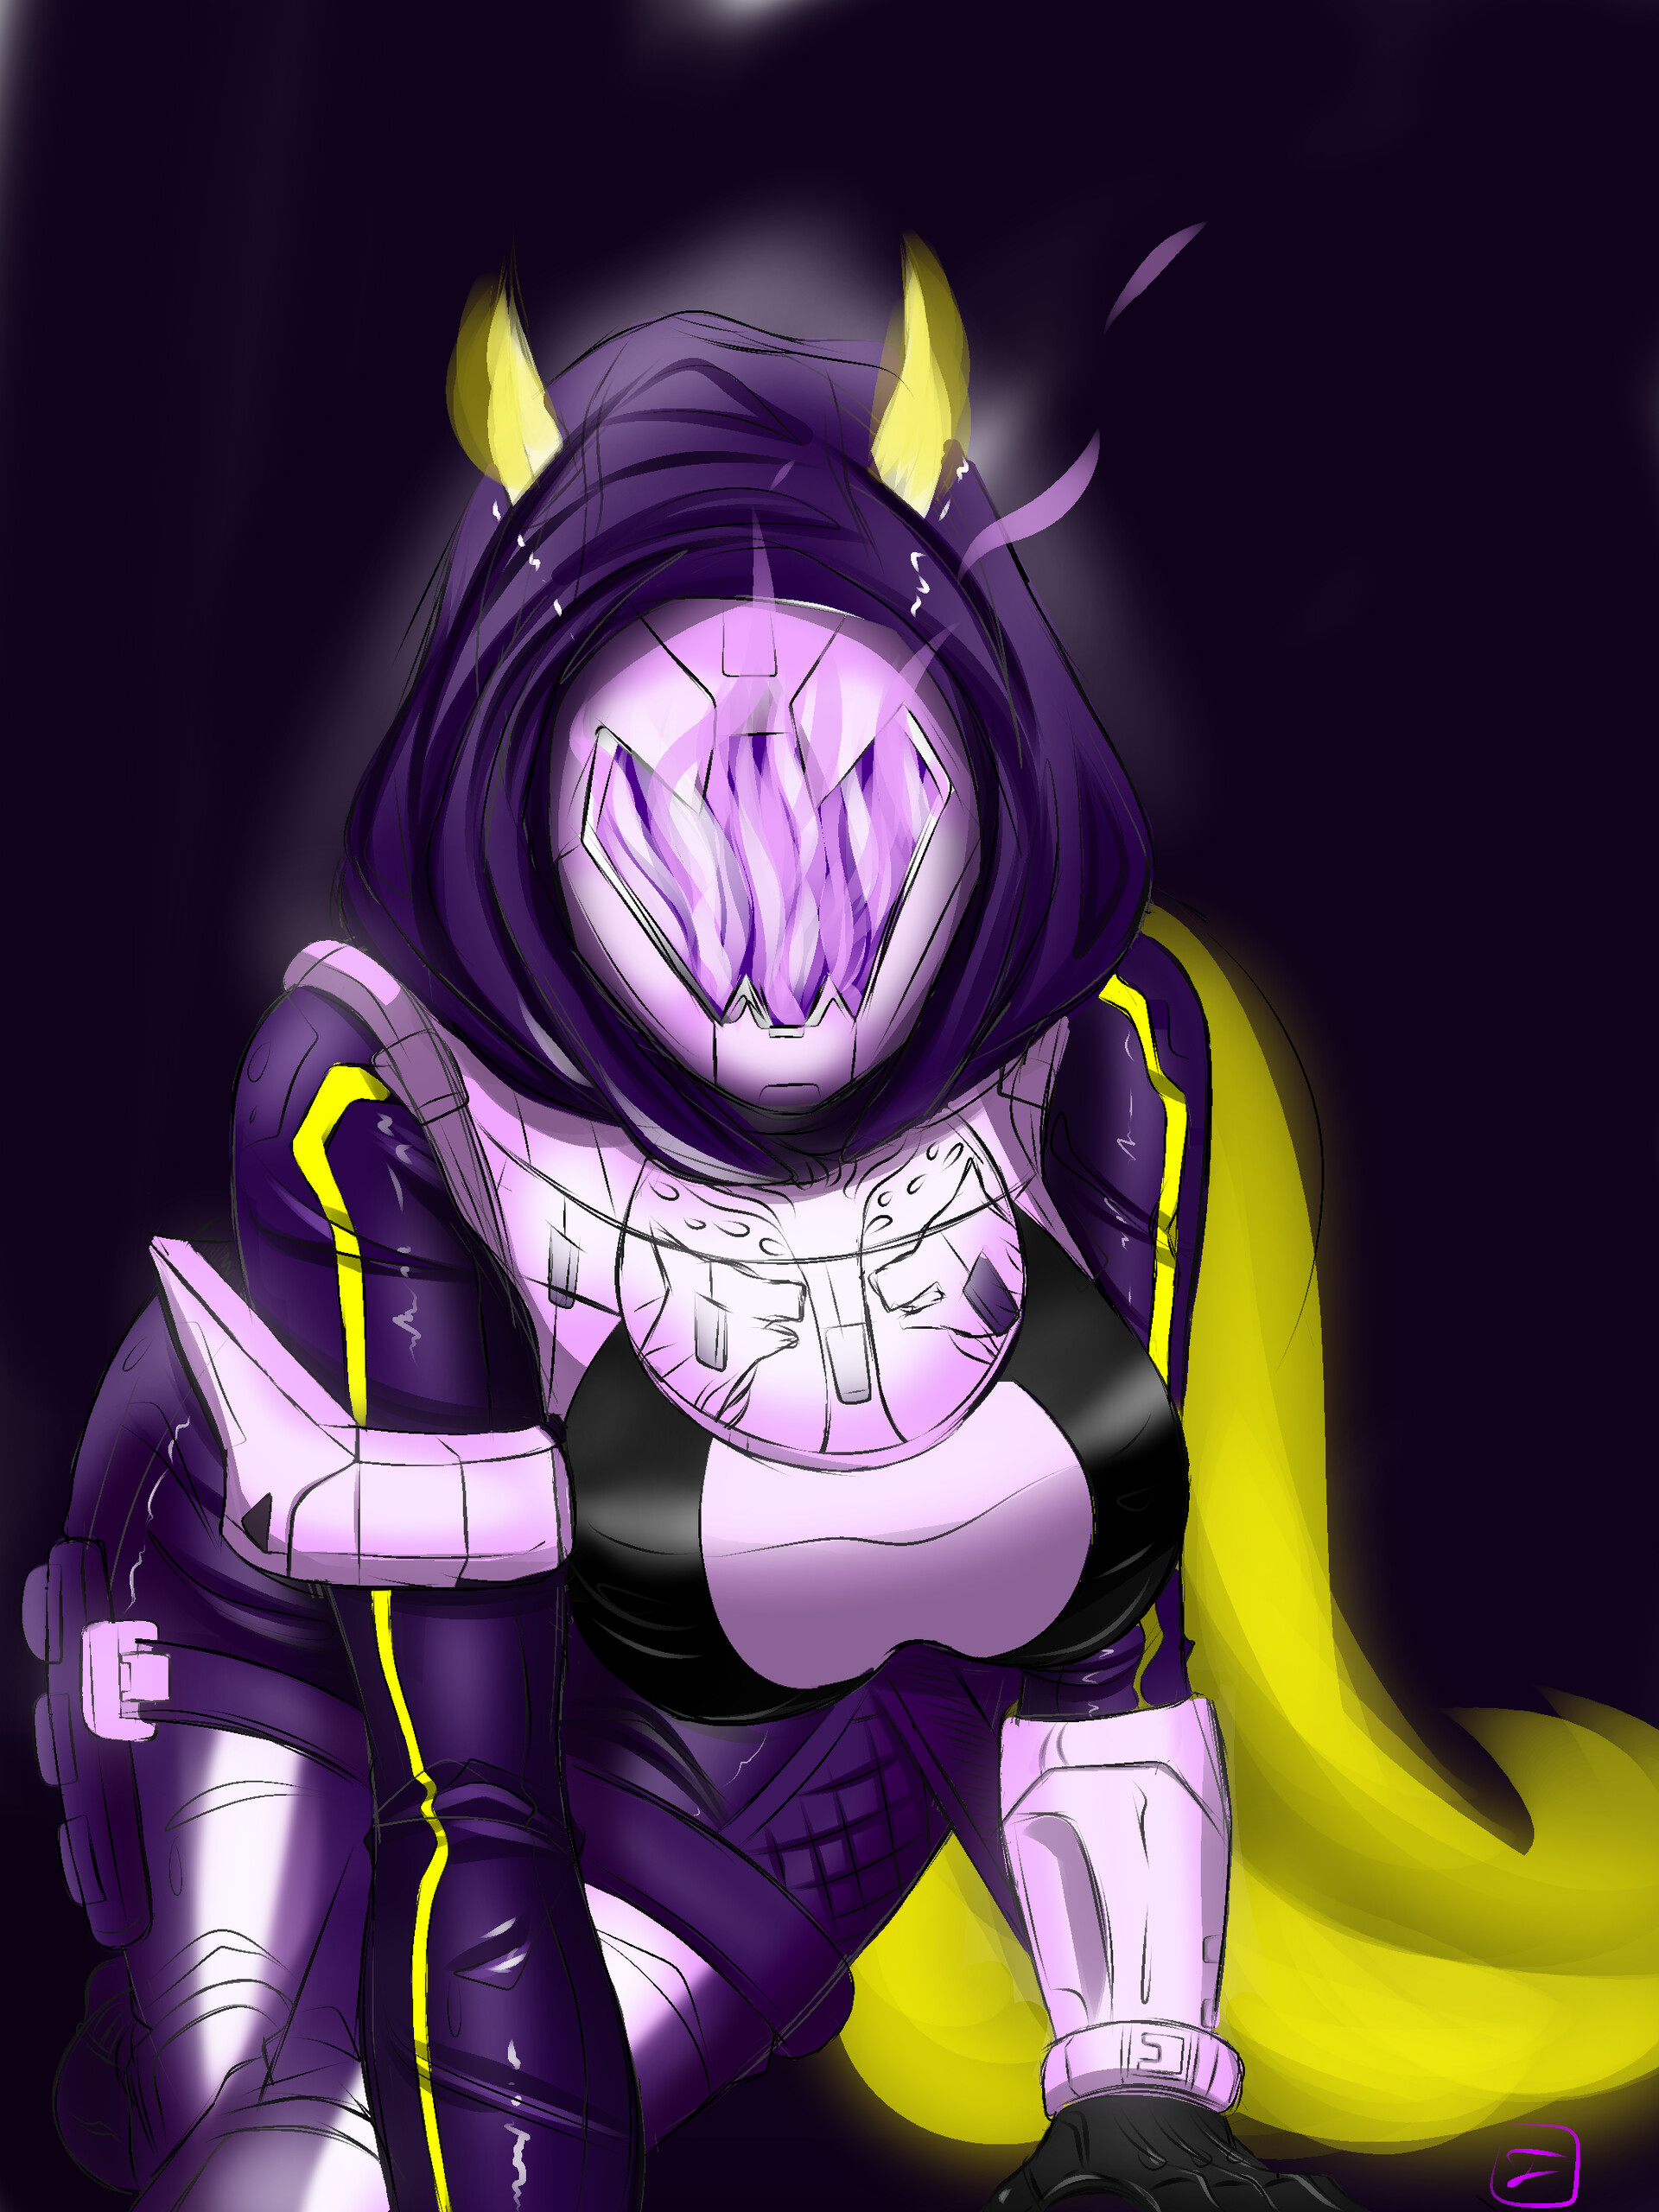 My destiny huntress